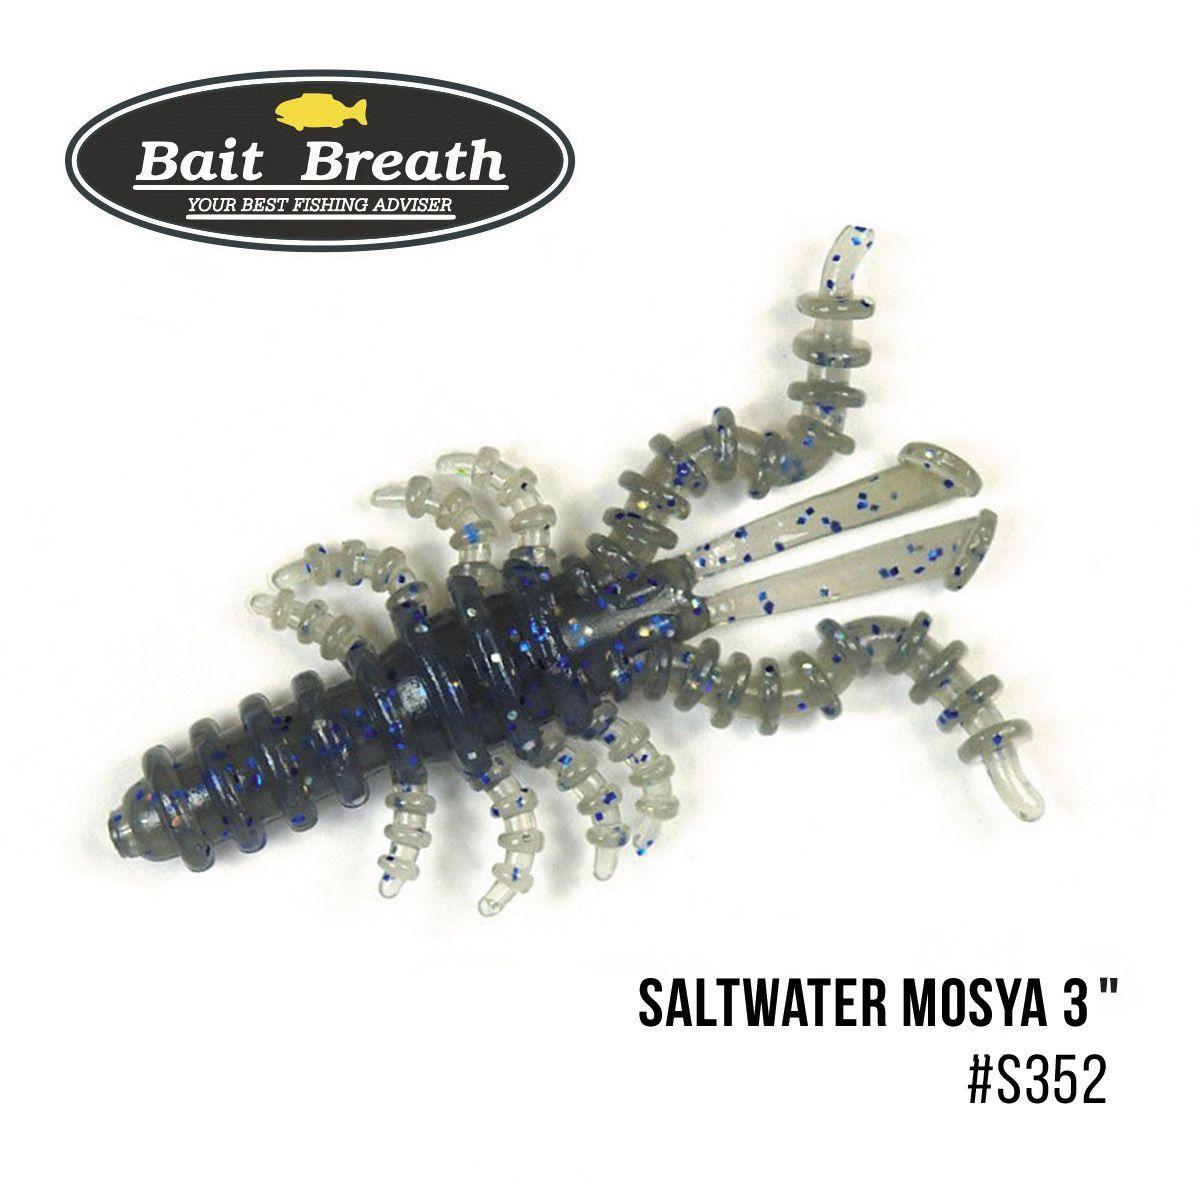 """.Приманка Bait Breath Saltwater Mosya 3"" (6 шт.) (S352 UV Hologram Smoke/Blue)"